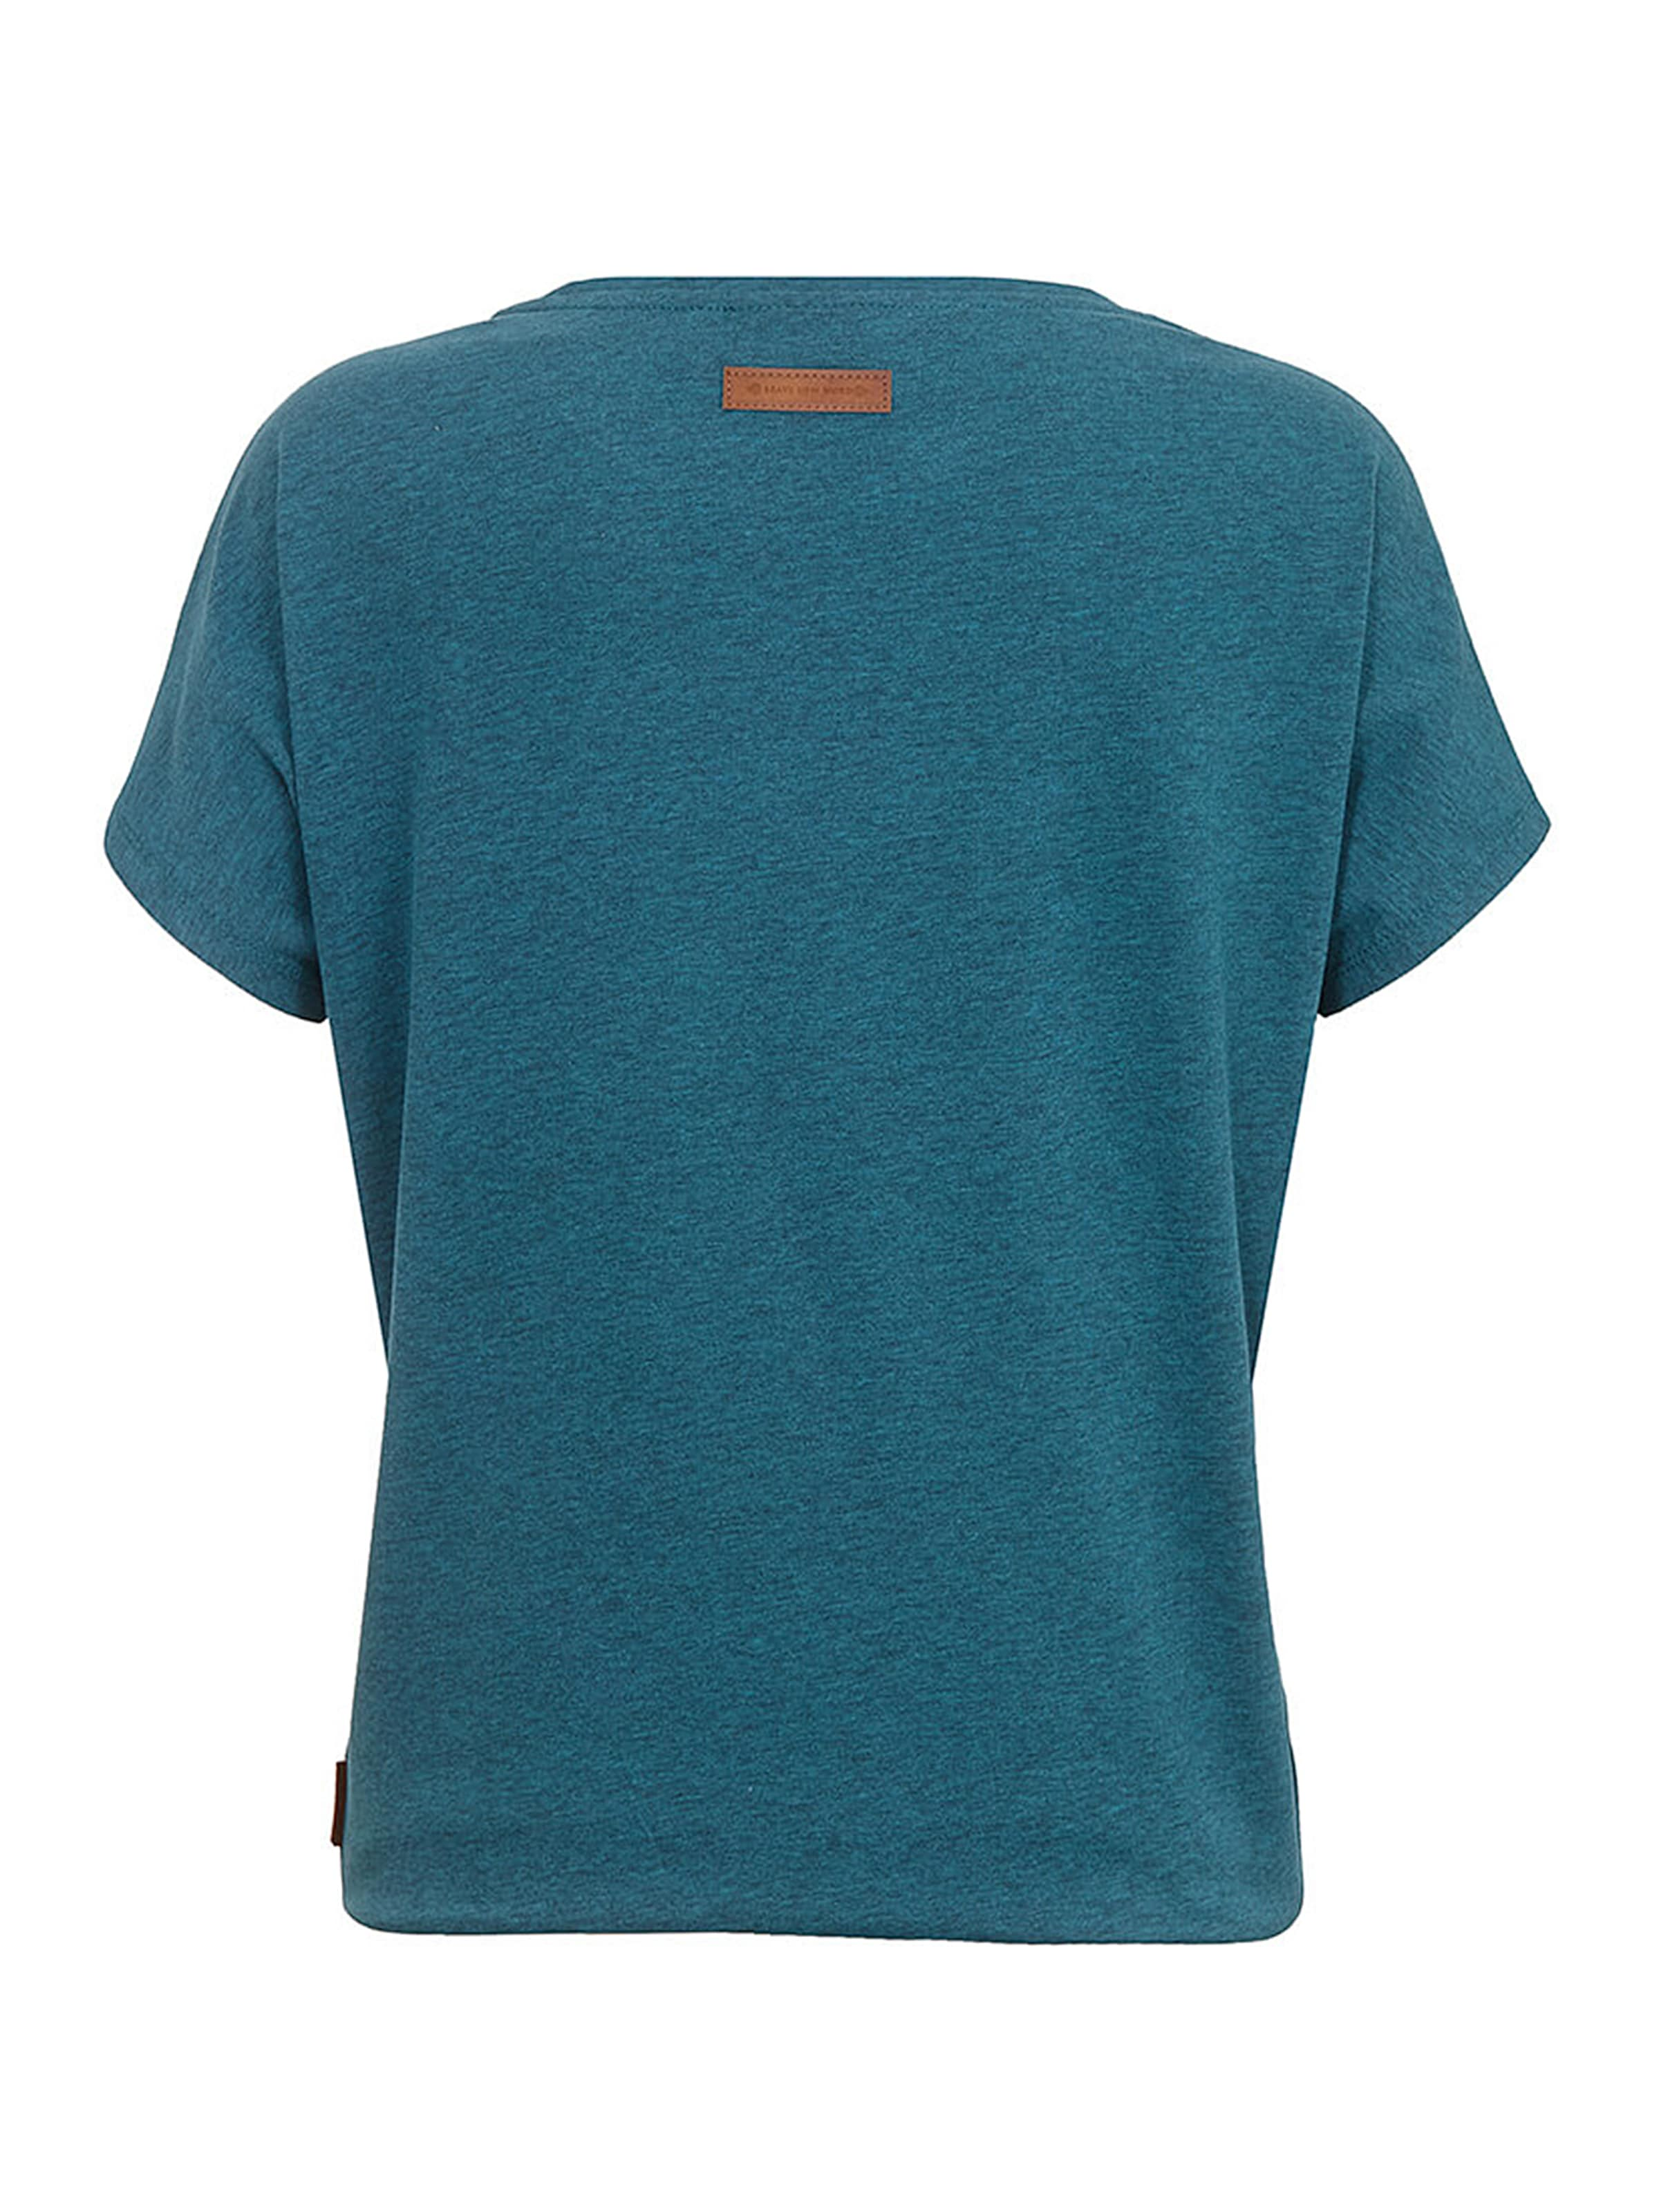 En Bleu 'räuber T Fotzenplotz' Naketano shirt pMqULGSzV